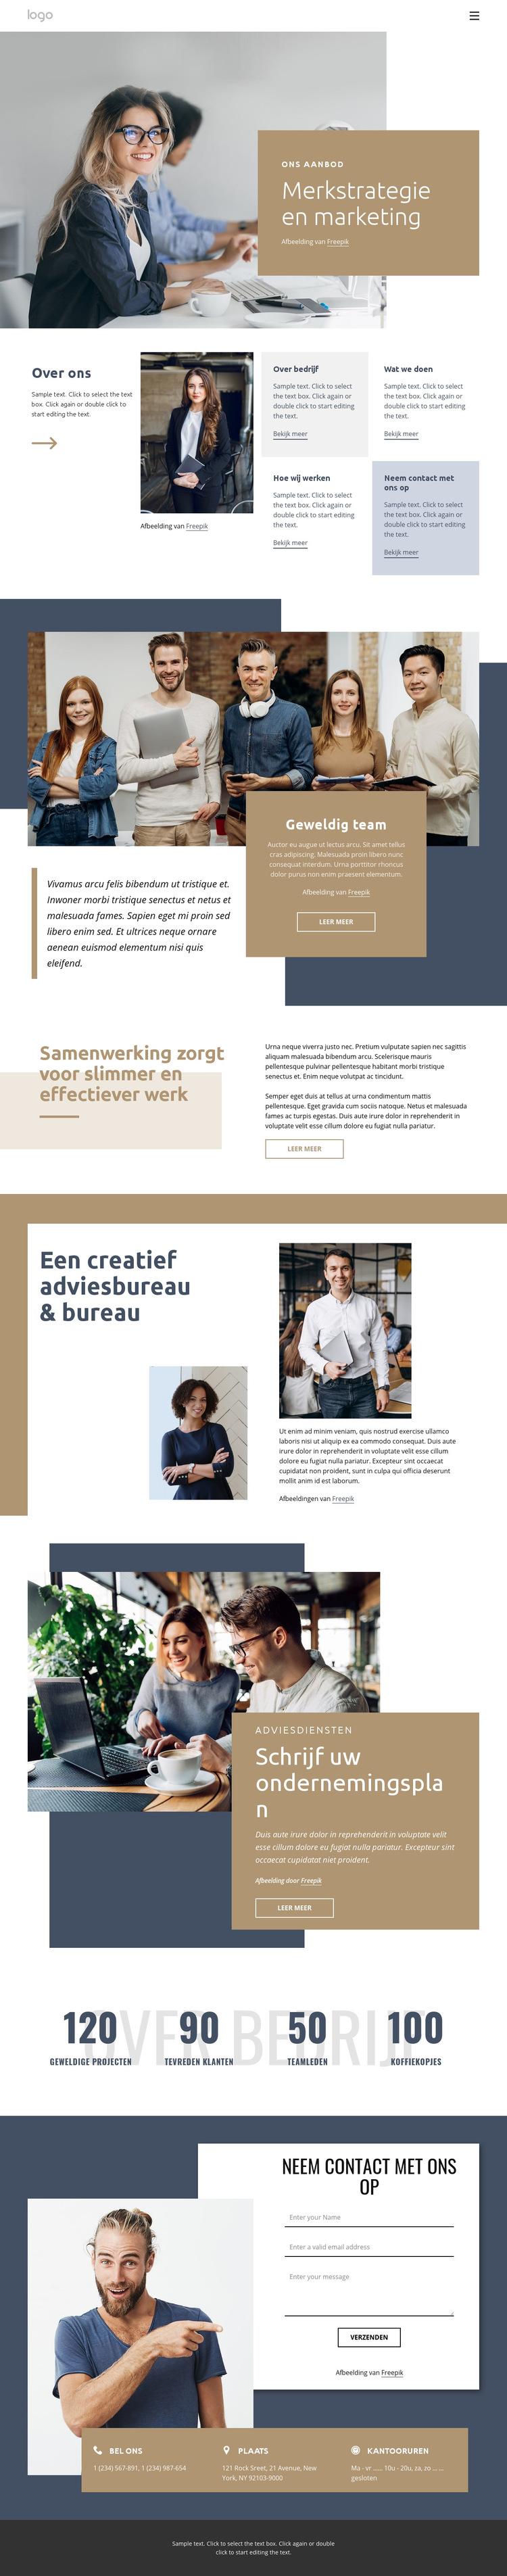 Merkstrategie en marketing Website sjabloon